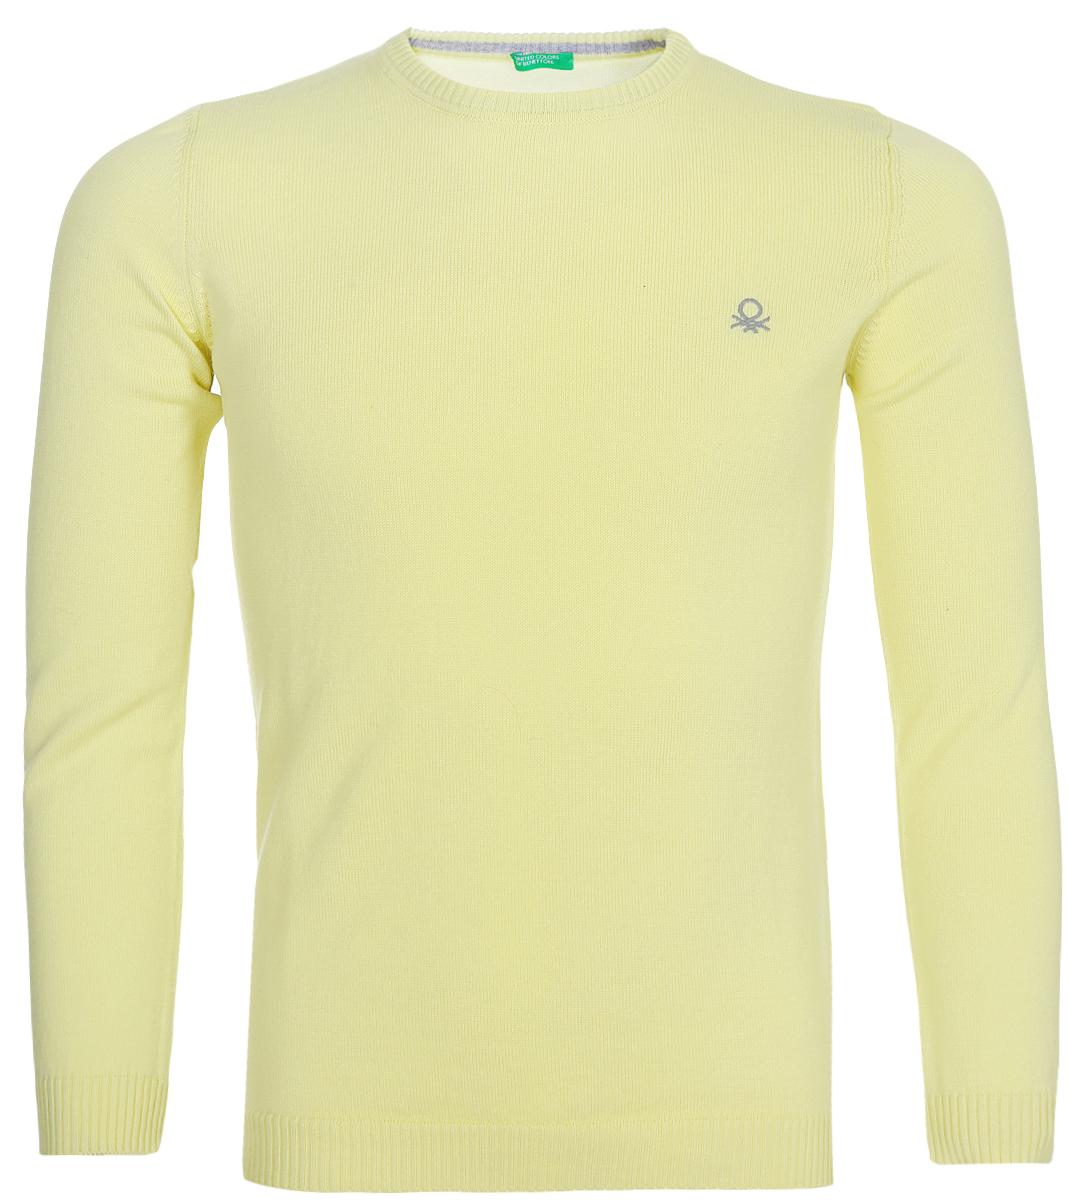 Фото - Свитшот для мальчика United Colors of Benetton, цвет: желтый. 197IQ1205_0H3. Размер 160 плавки united colors of benetton united colors of benetton un012ewacdk6